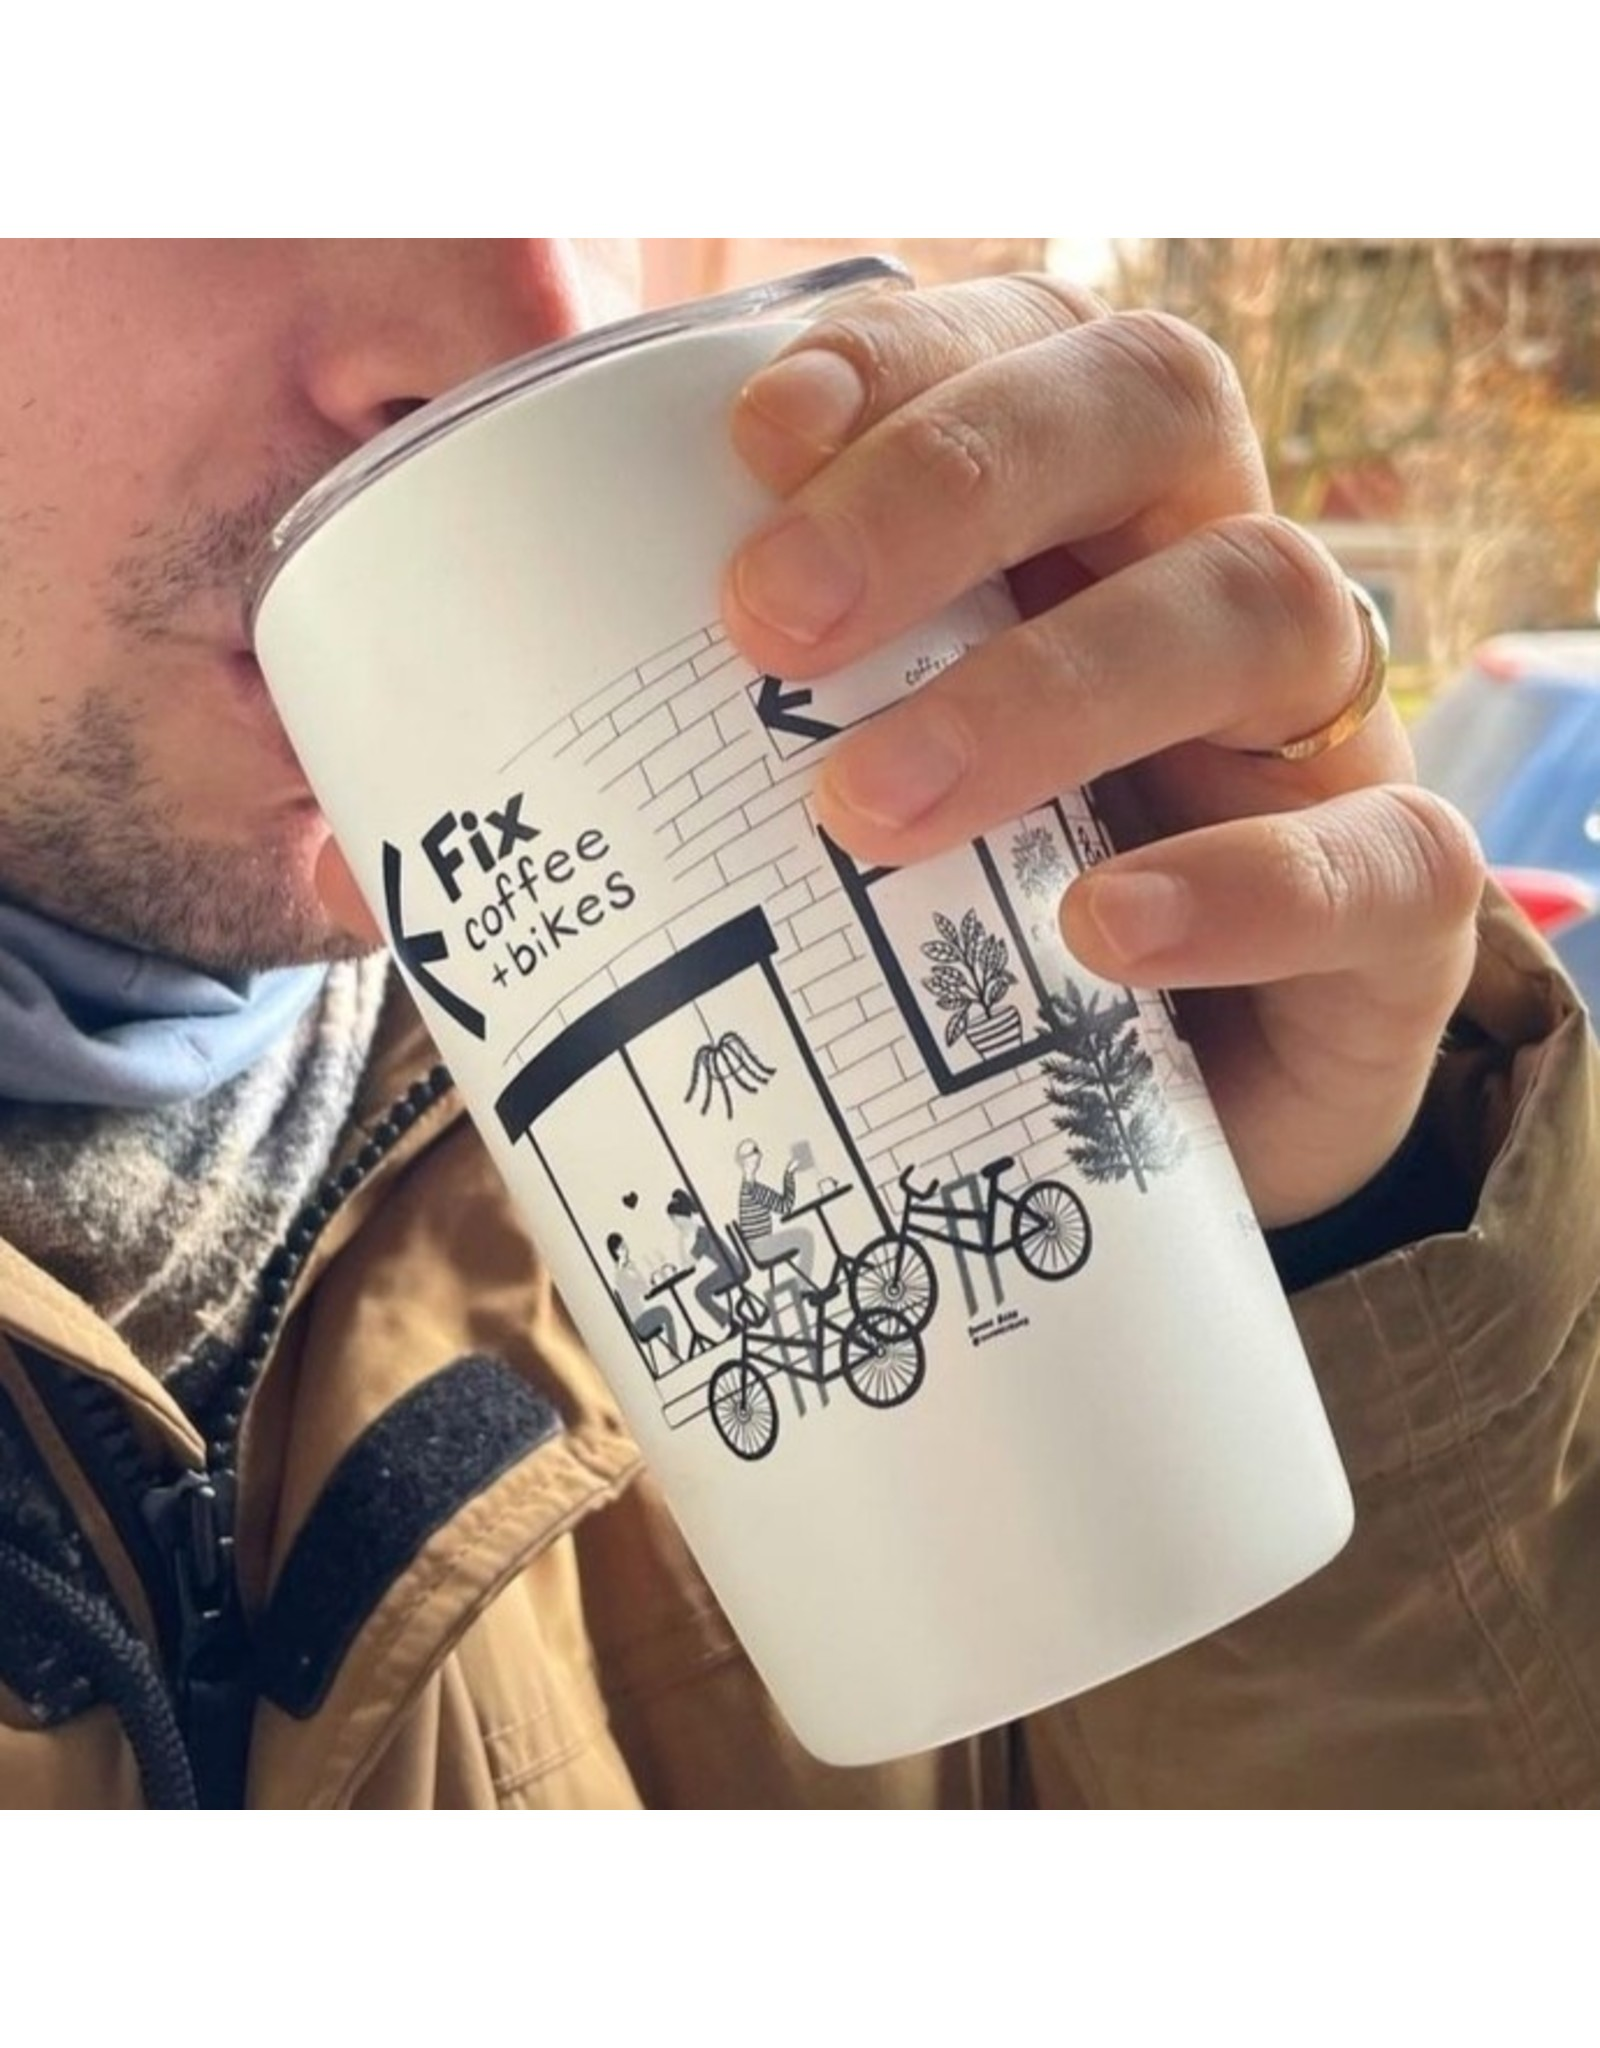 Fix Coffee+Bikes Fix 12oz Miir Tumbler by SB